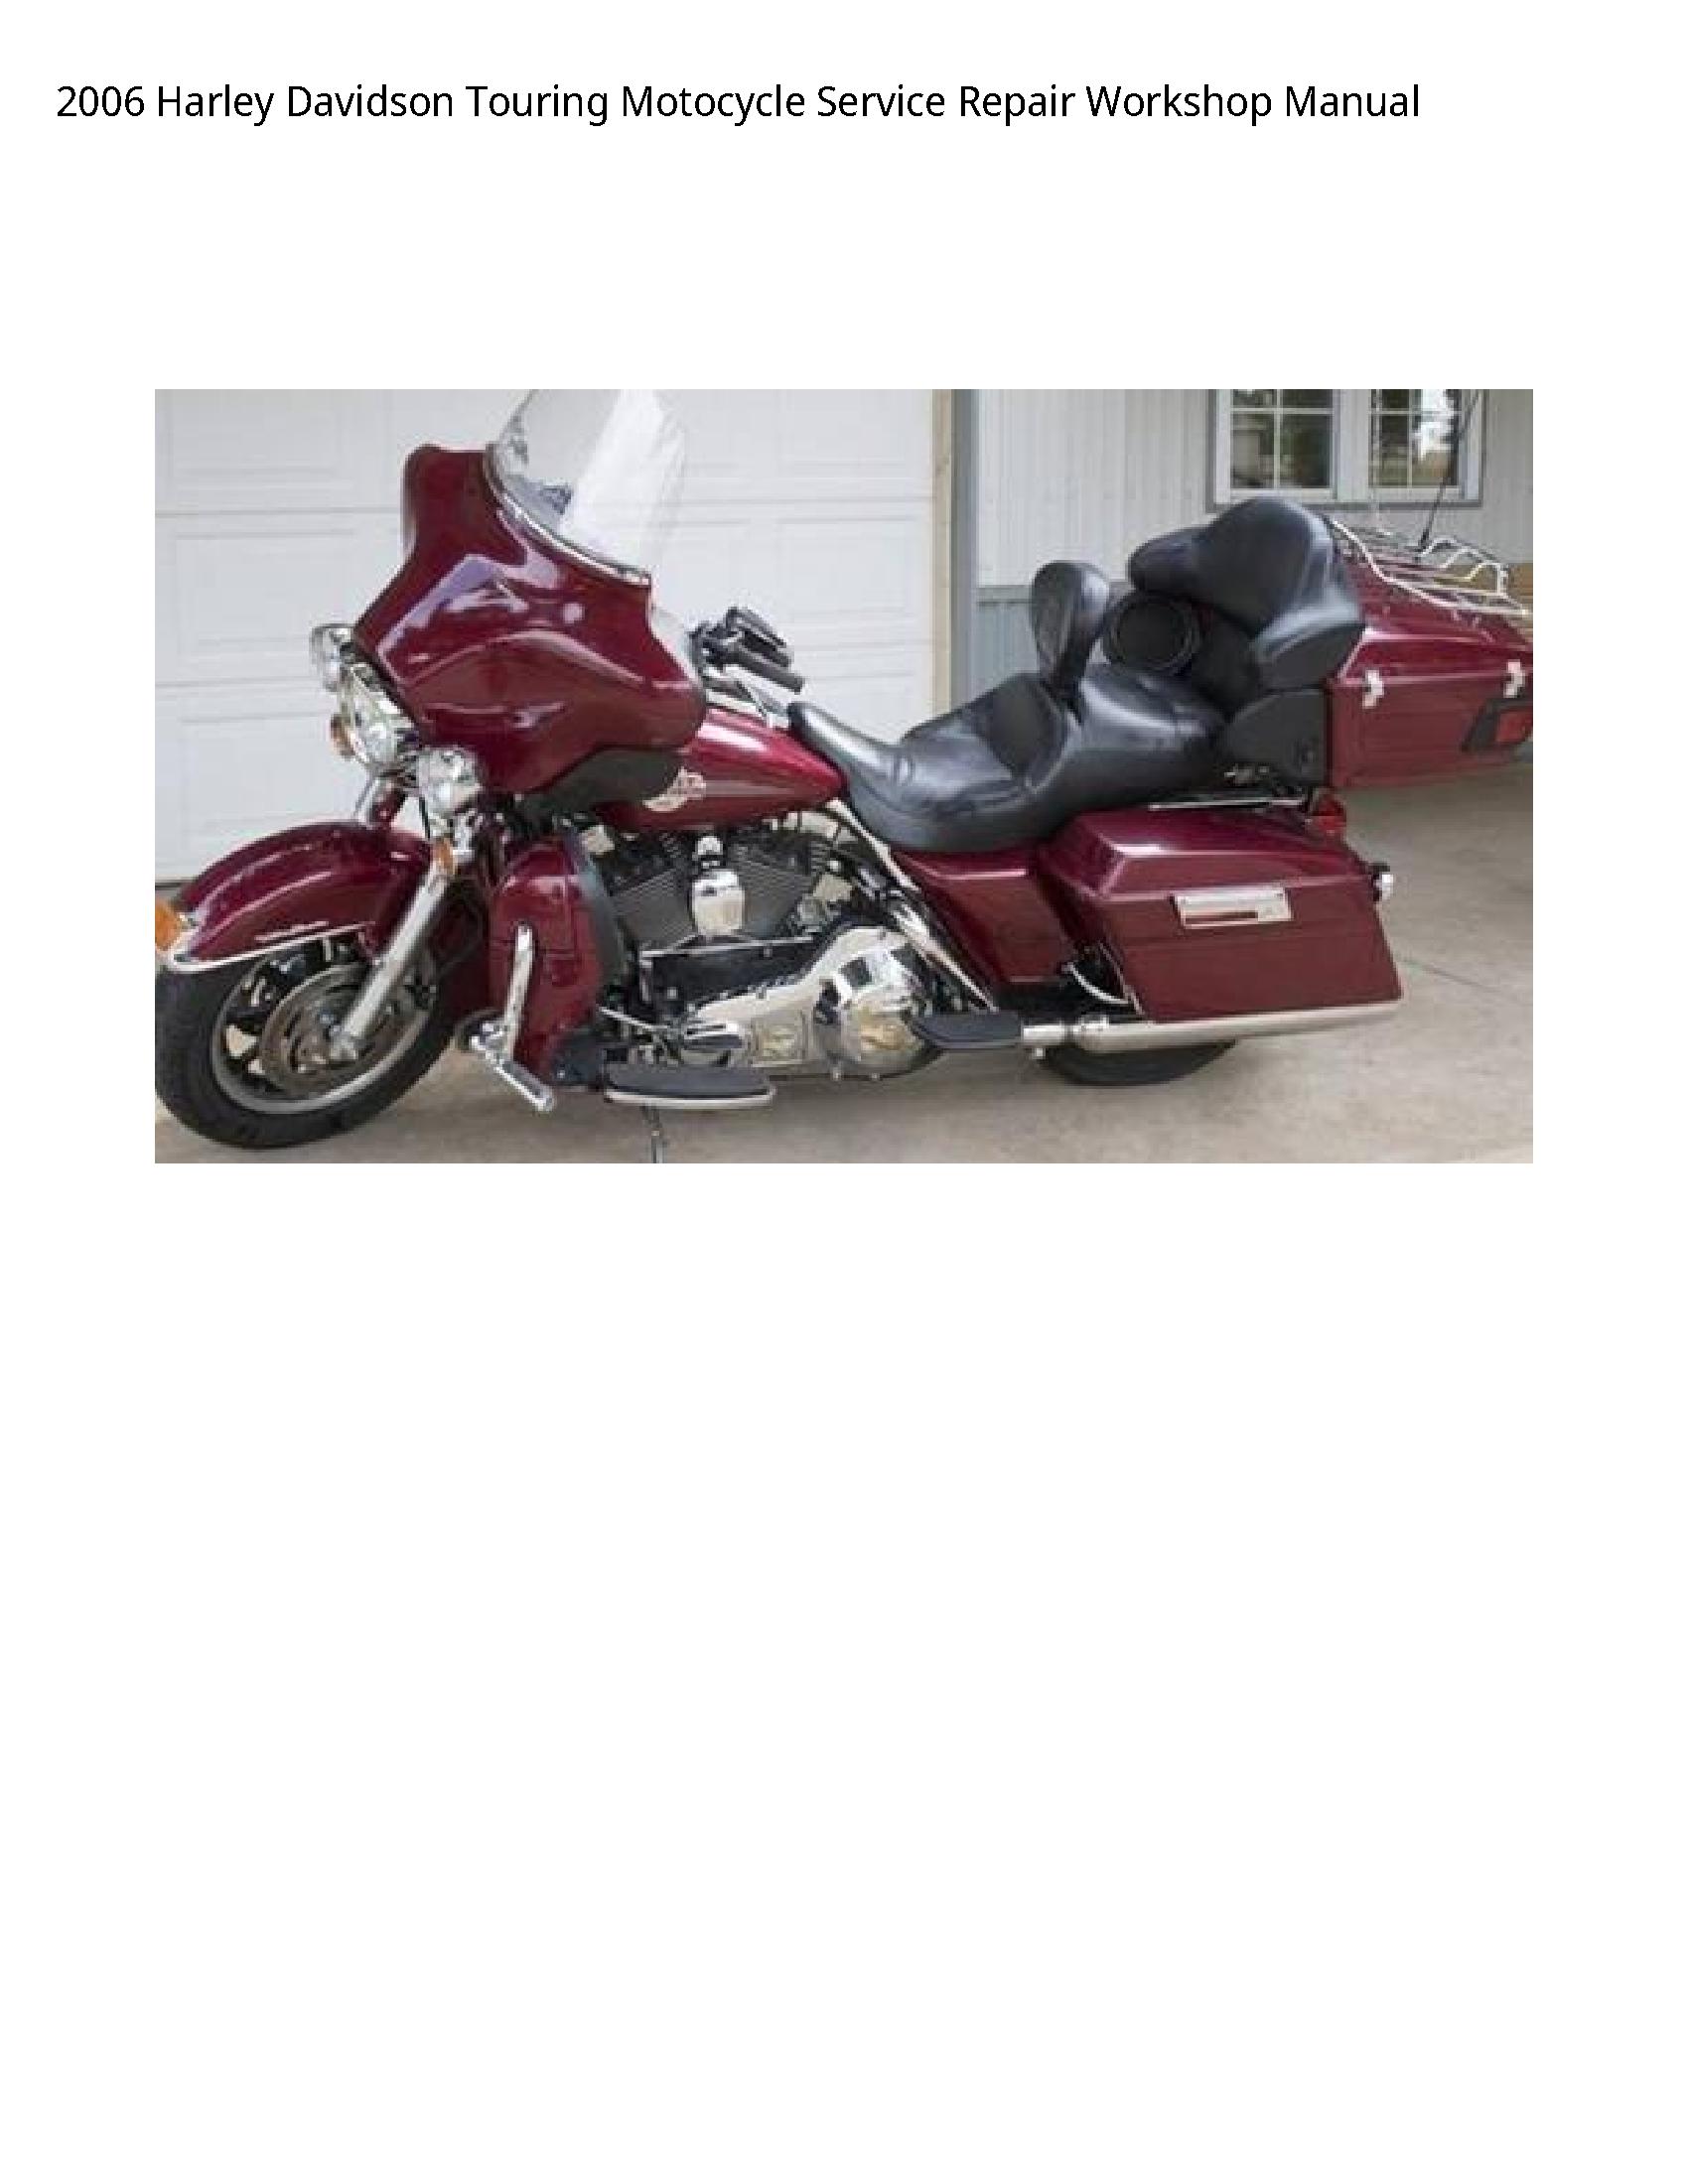 Harley Davidson Touring Motocycle manual